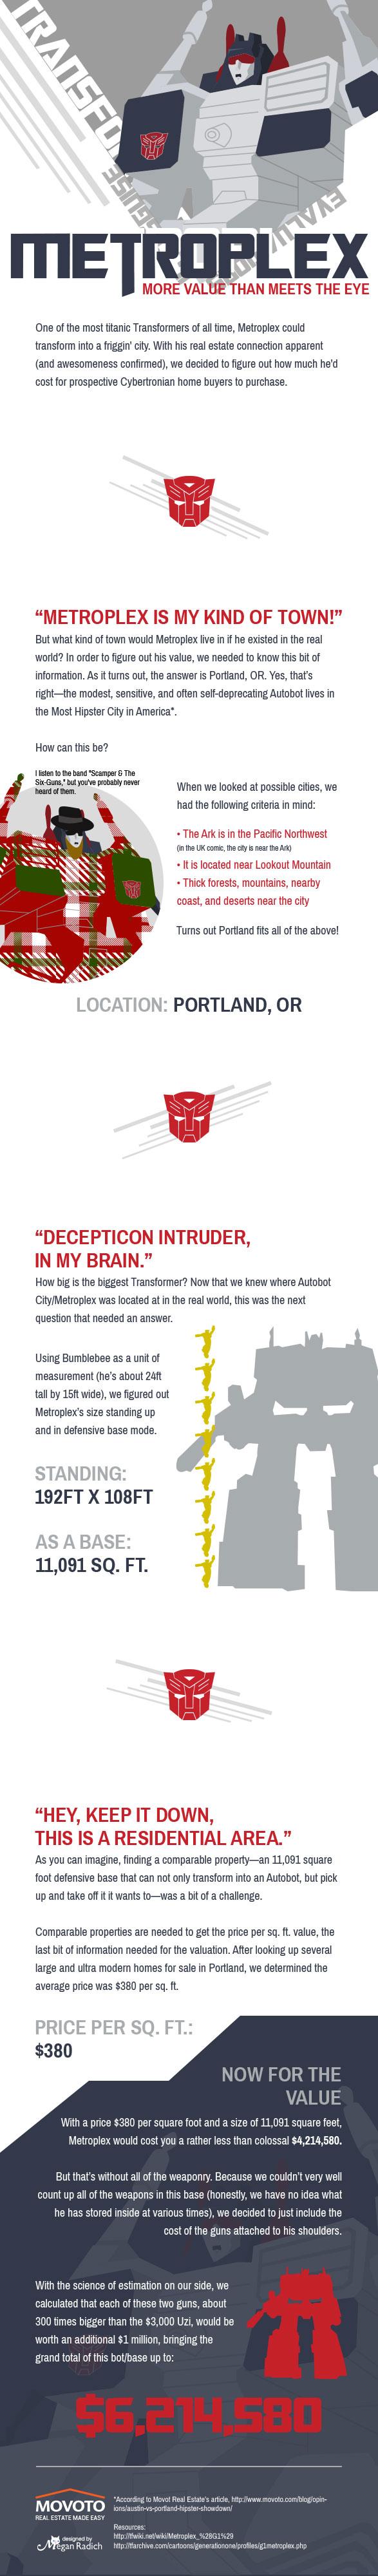 metroplex-infographic